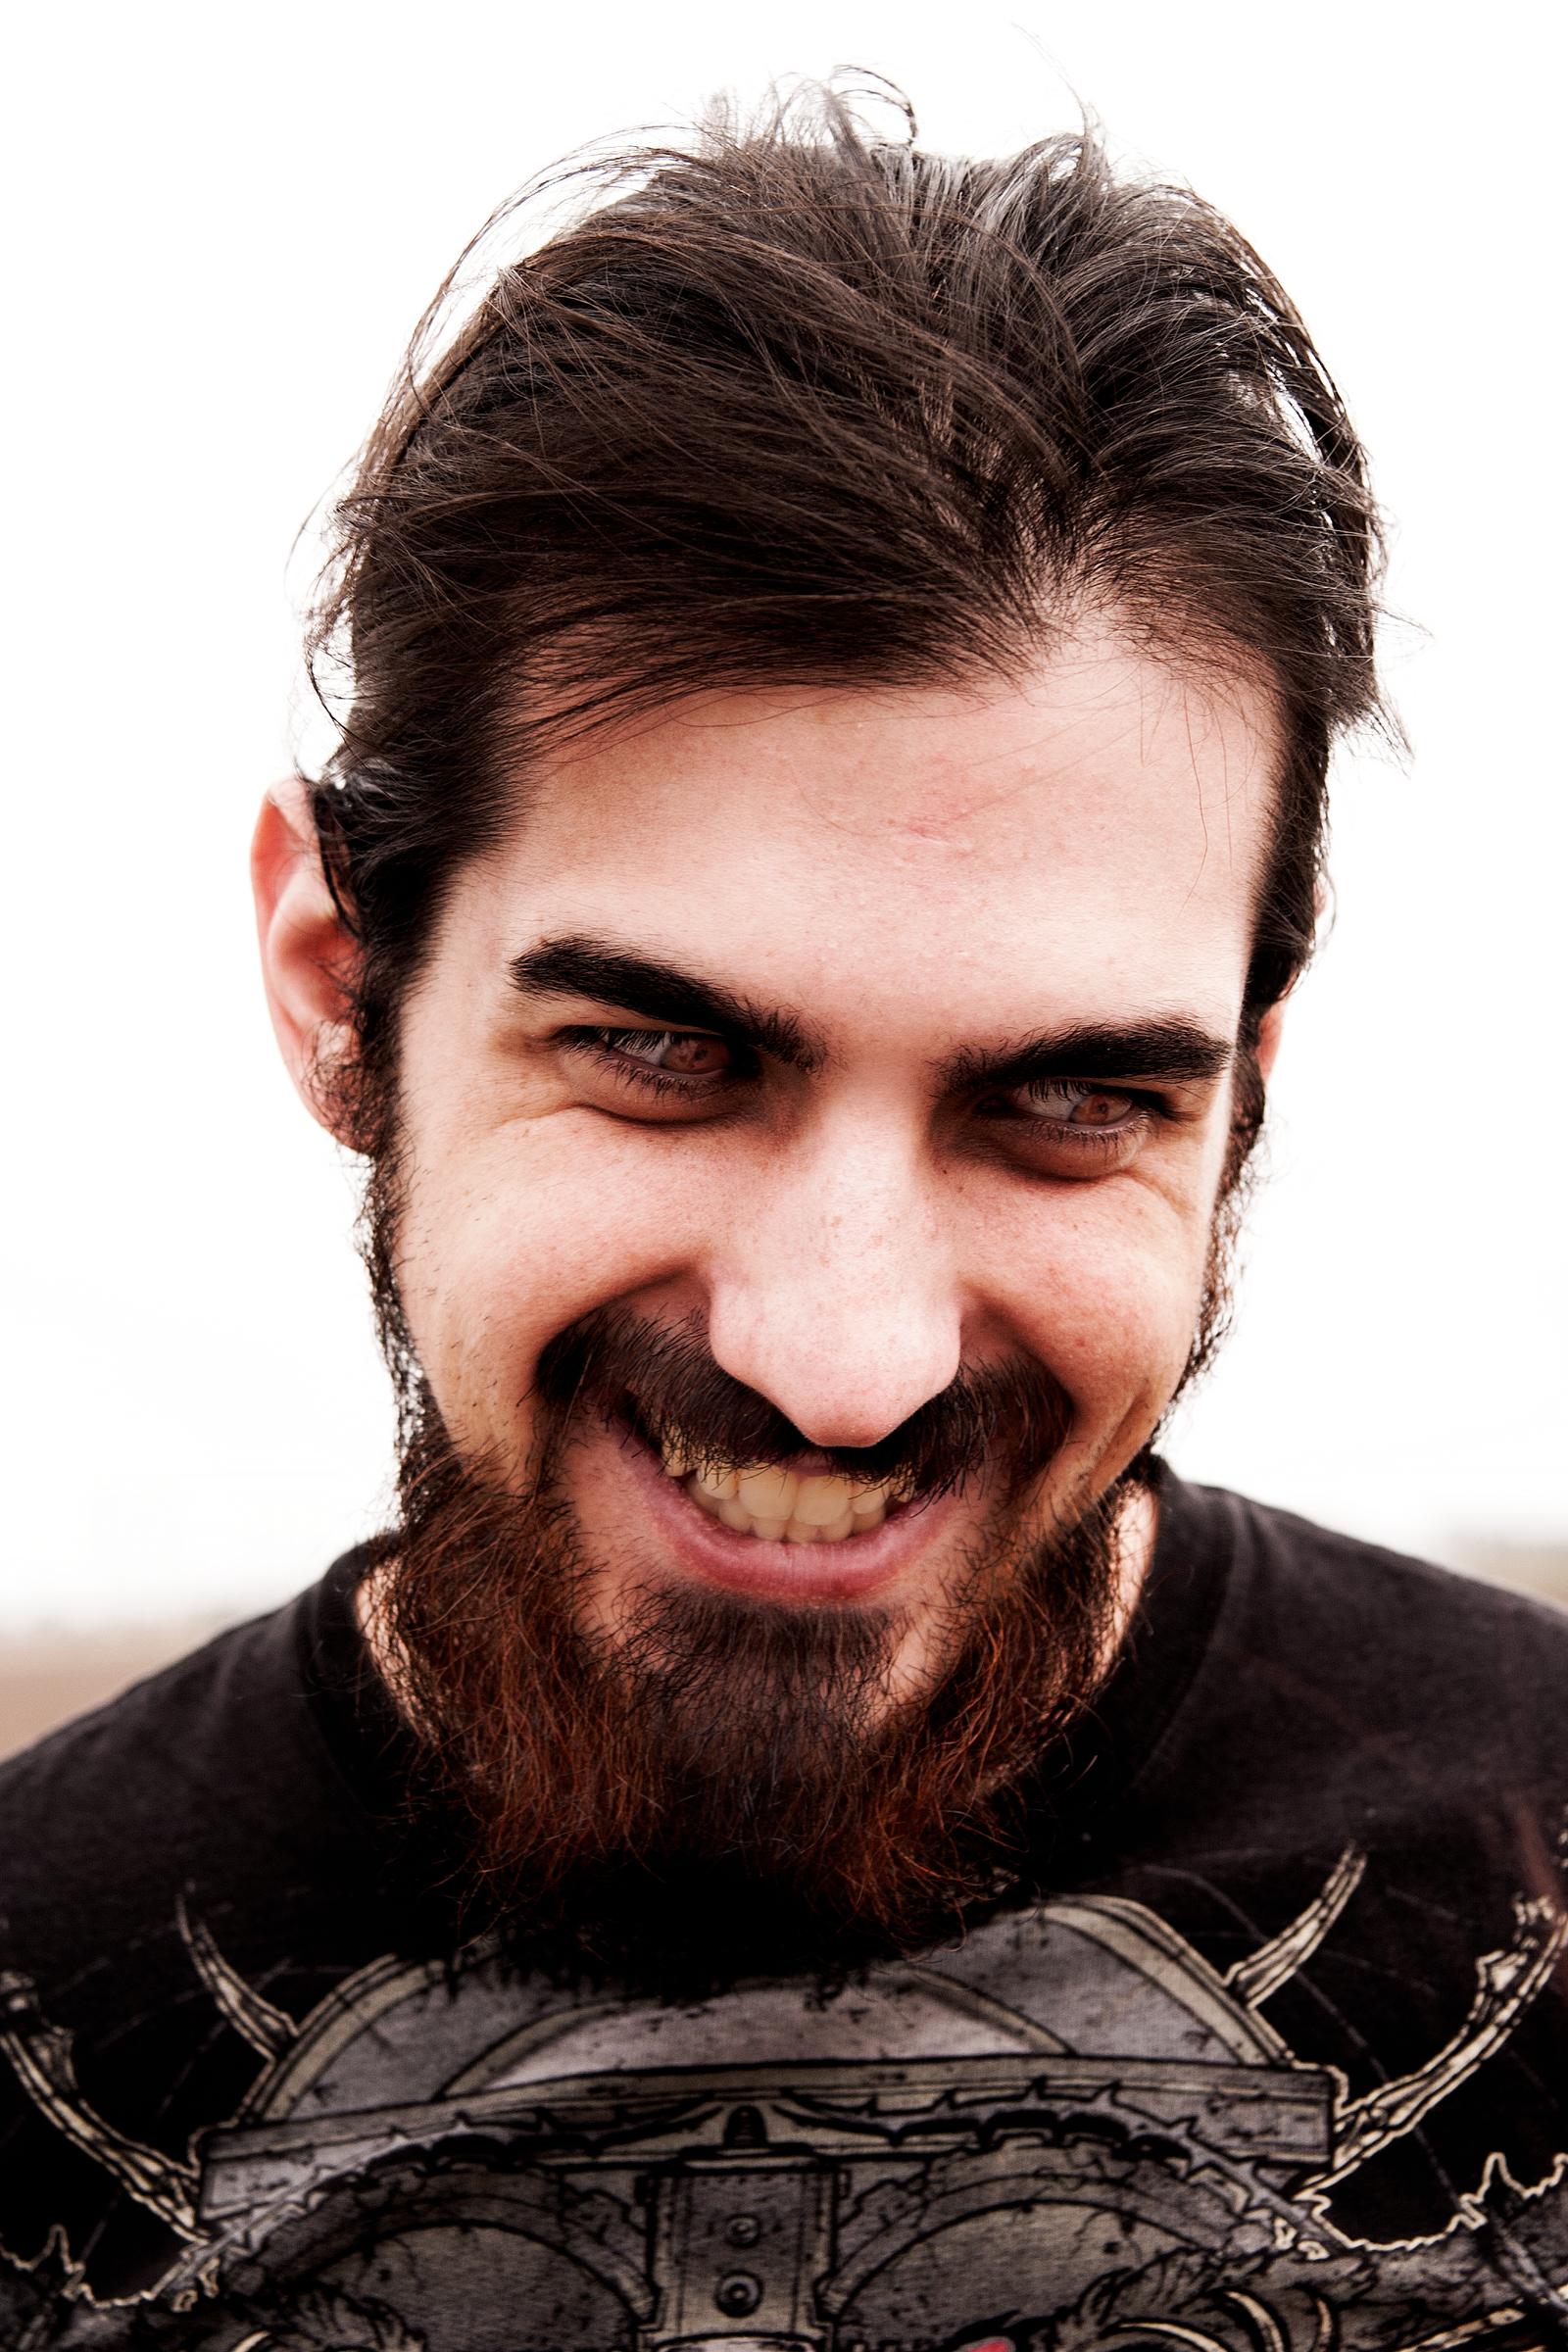 SteinZupancic's Profile Picture